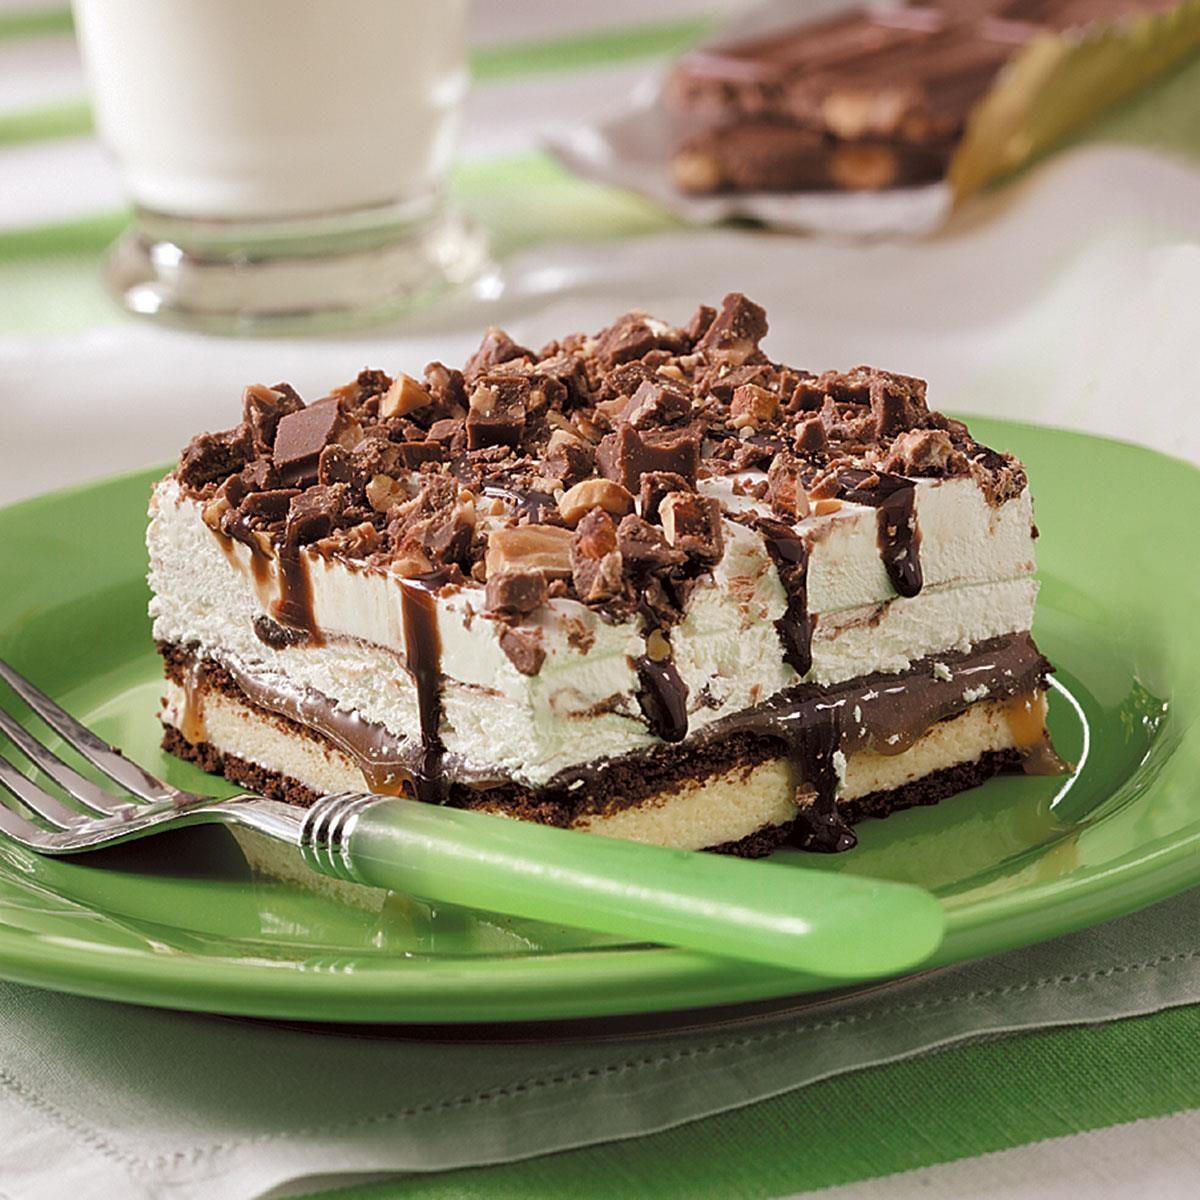 Easy Ice Cream Sandwich Dessert Recipe